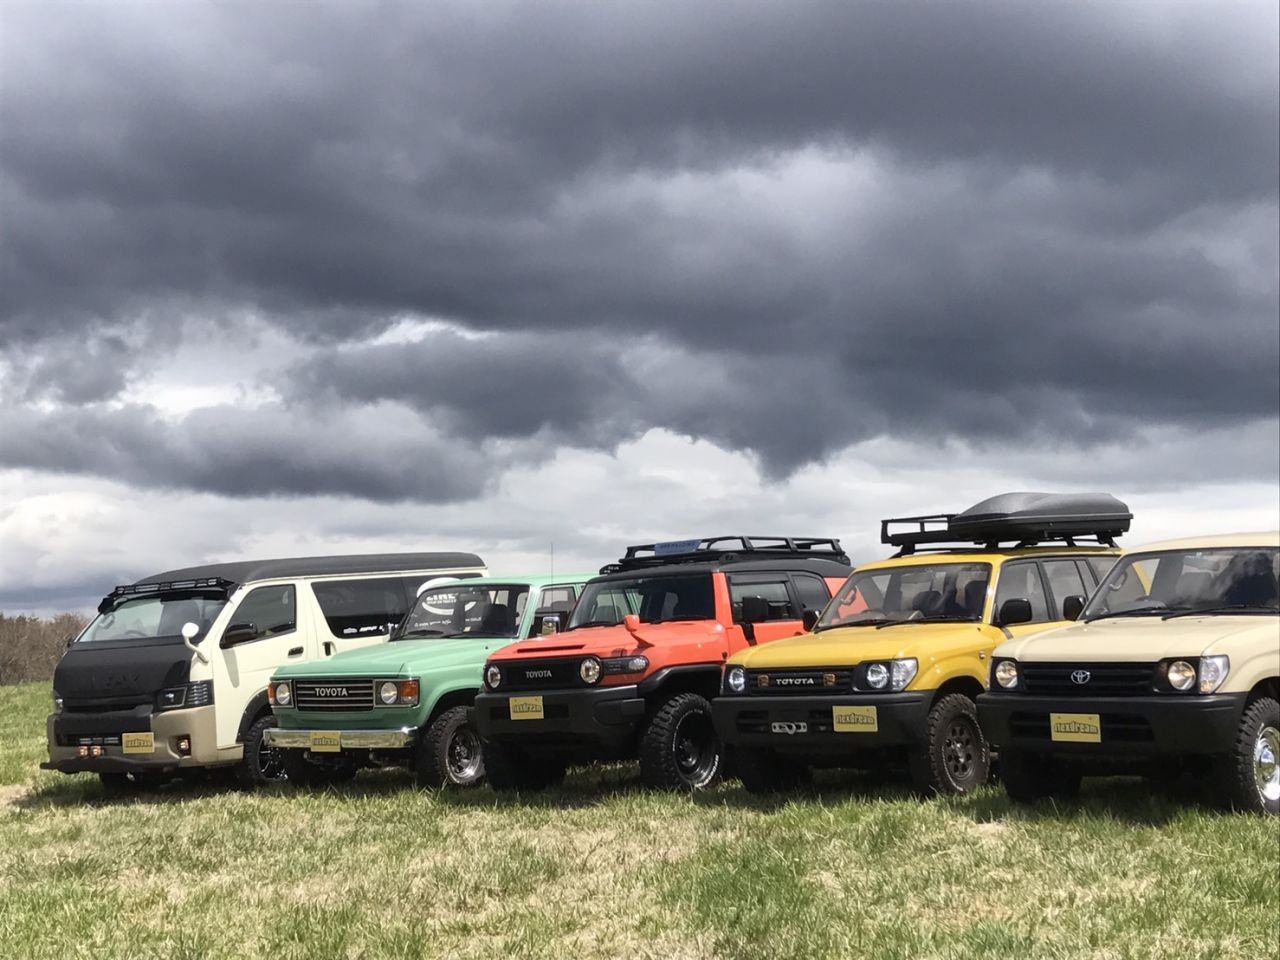 Ogawaテント展示会に出展した車たちで記念写真